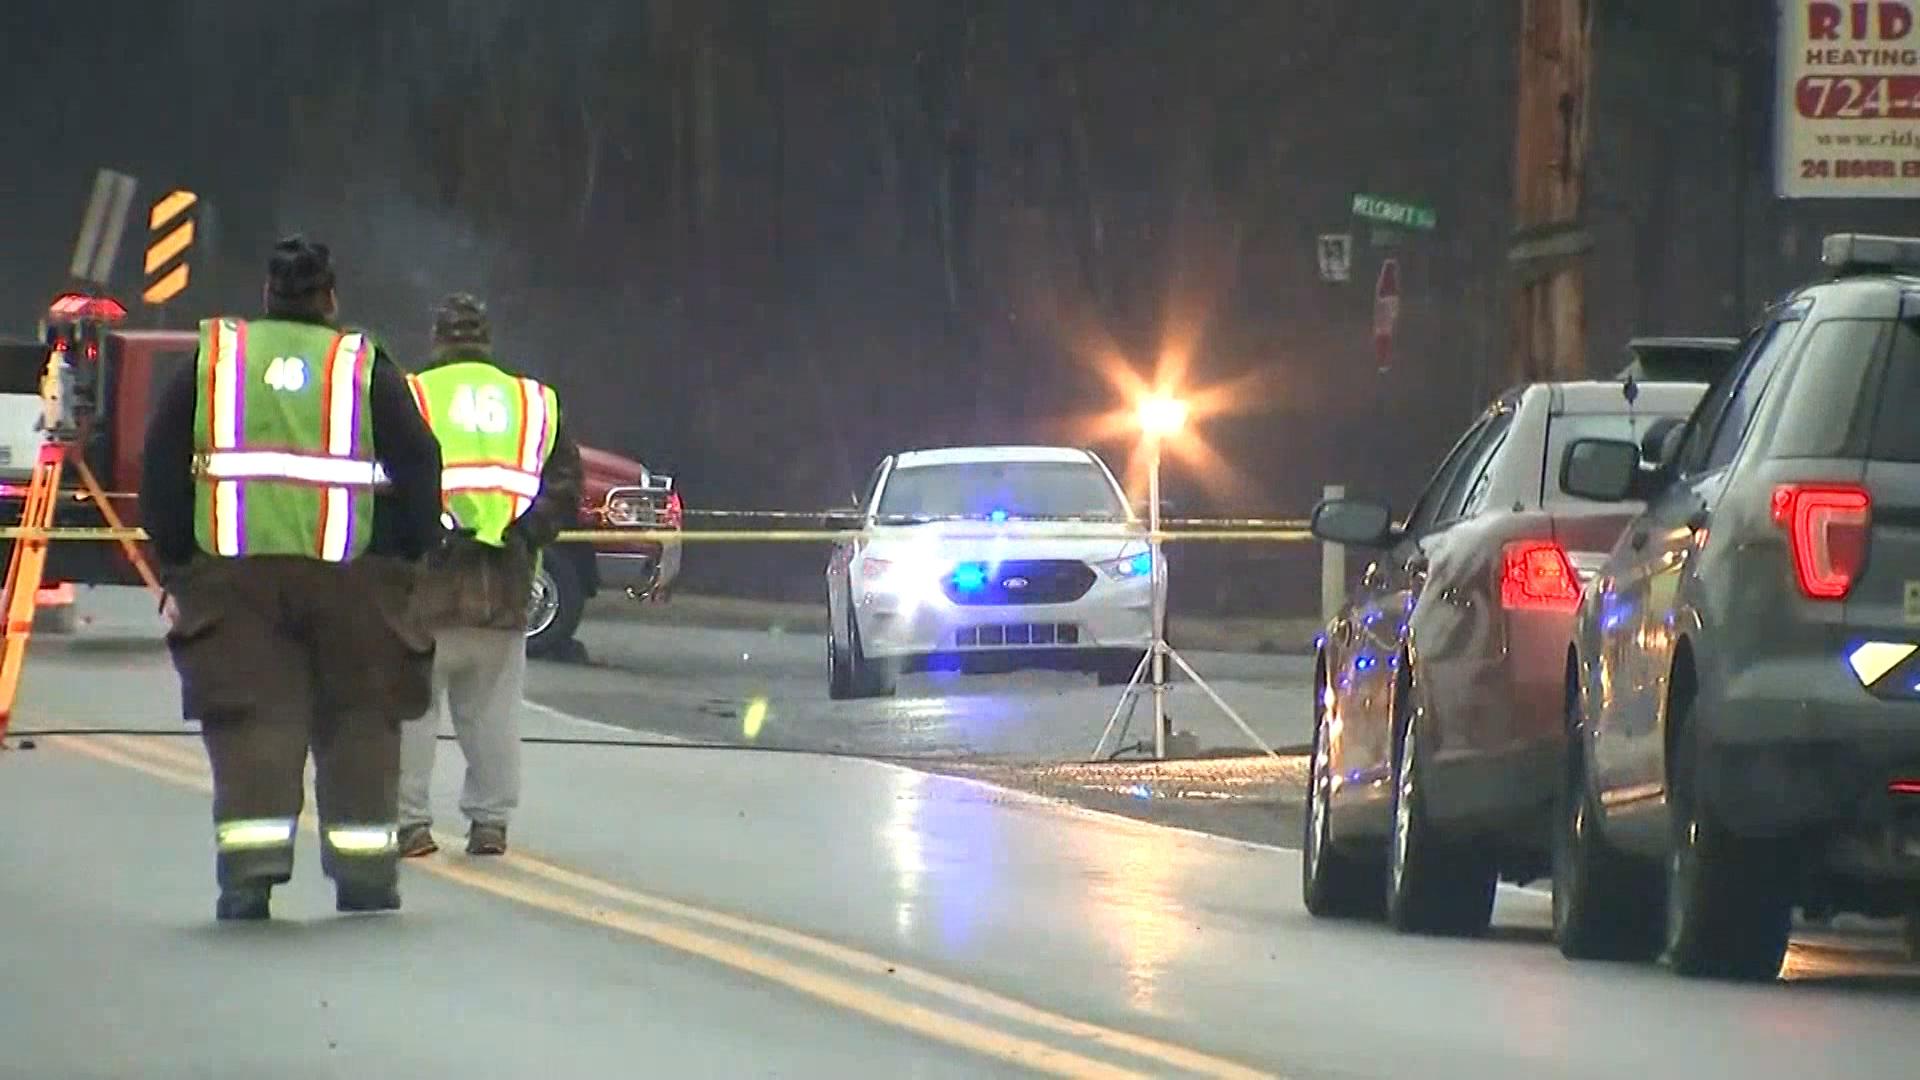 Four dead, gunman hospitalized in Pennsylvania shooting